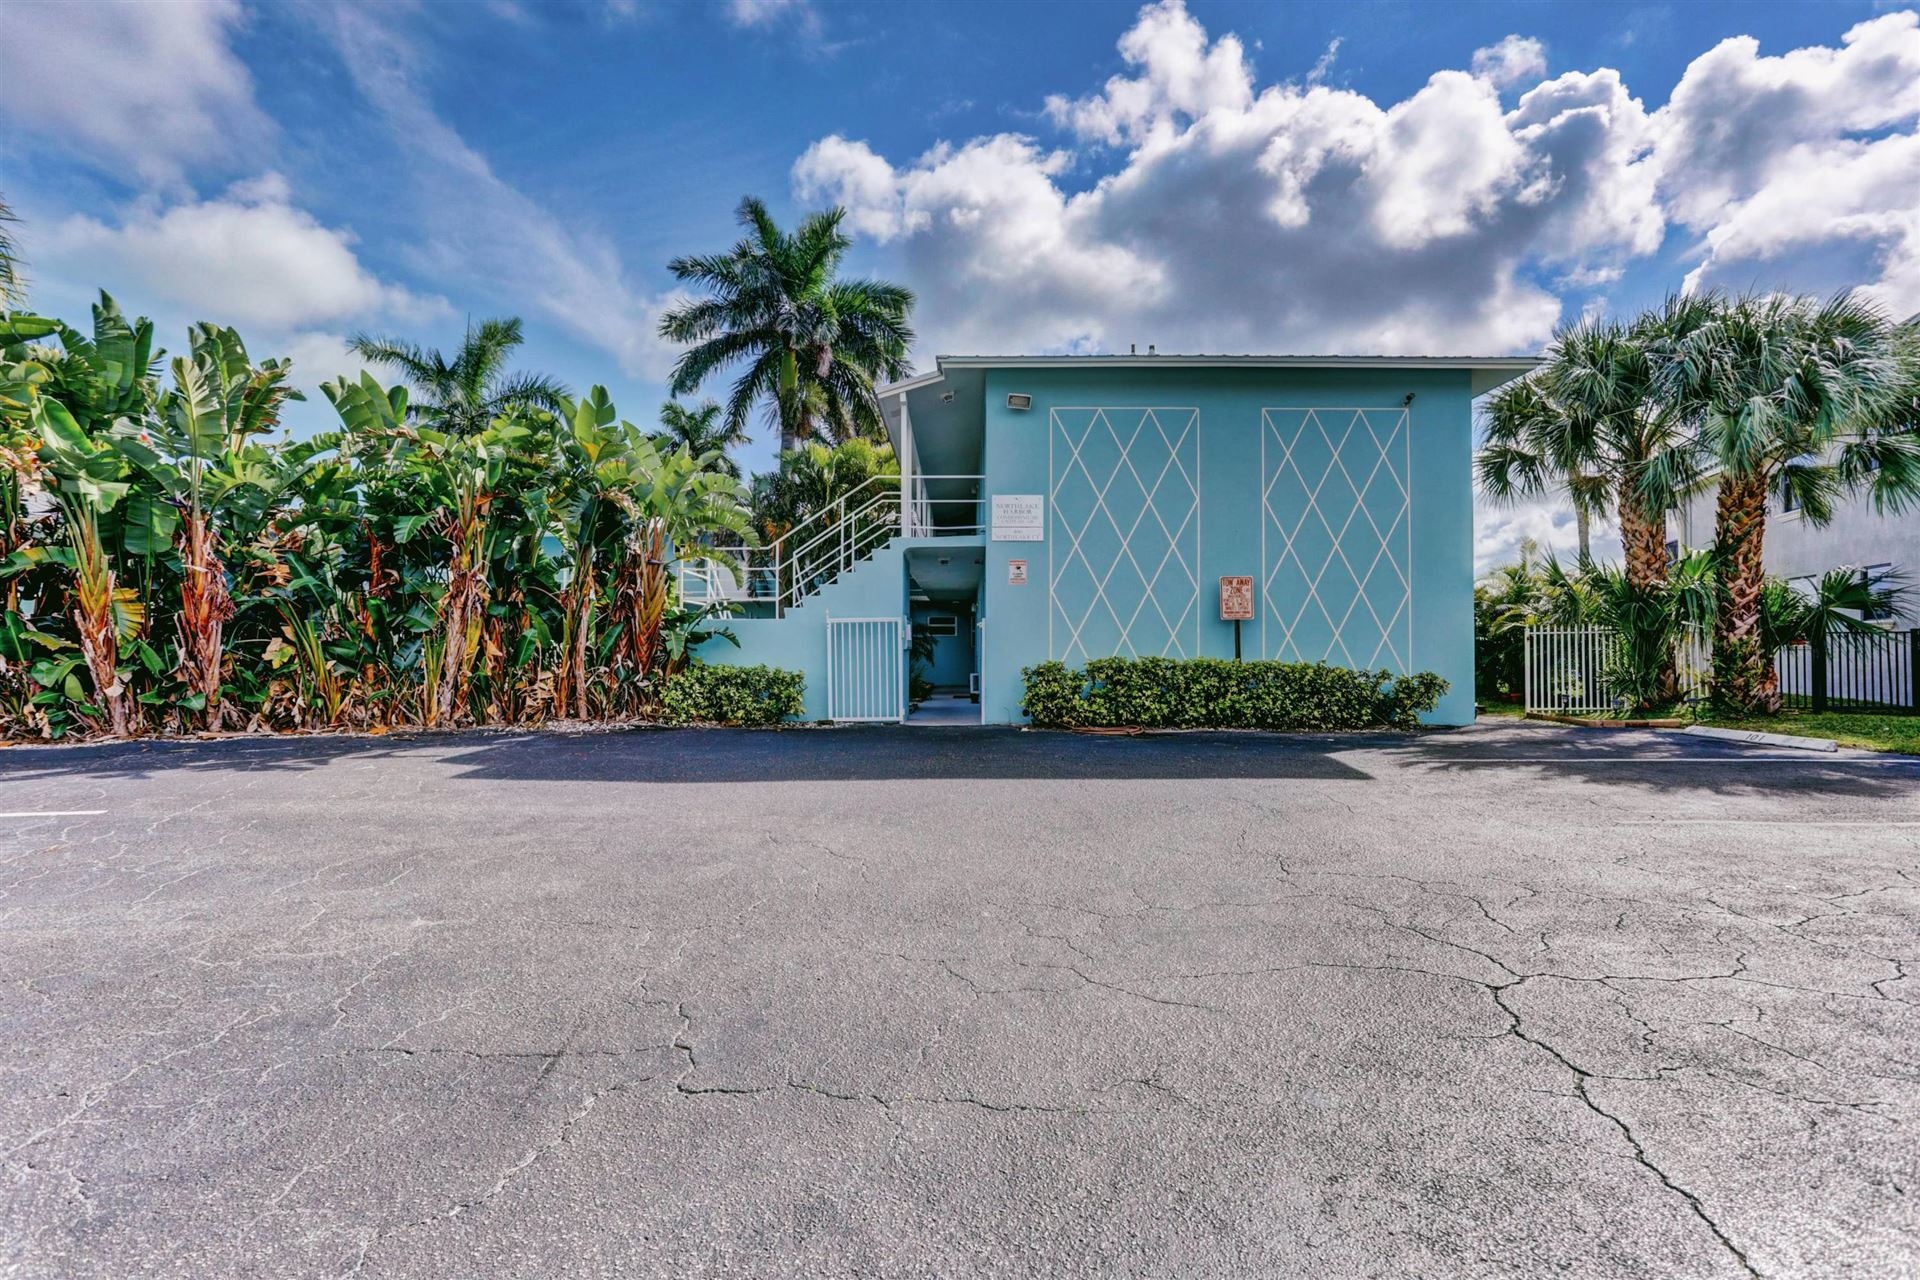 Photo of 400 Northlake Court #104, North Palm Beach, FL 33408 (MLS # RX-10687395)